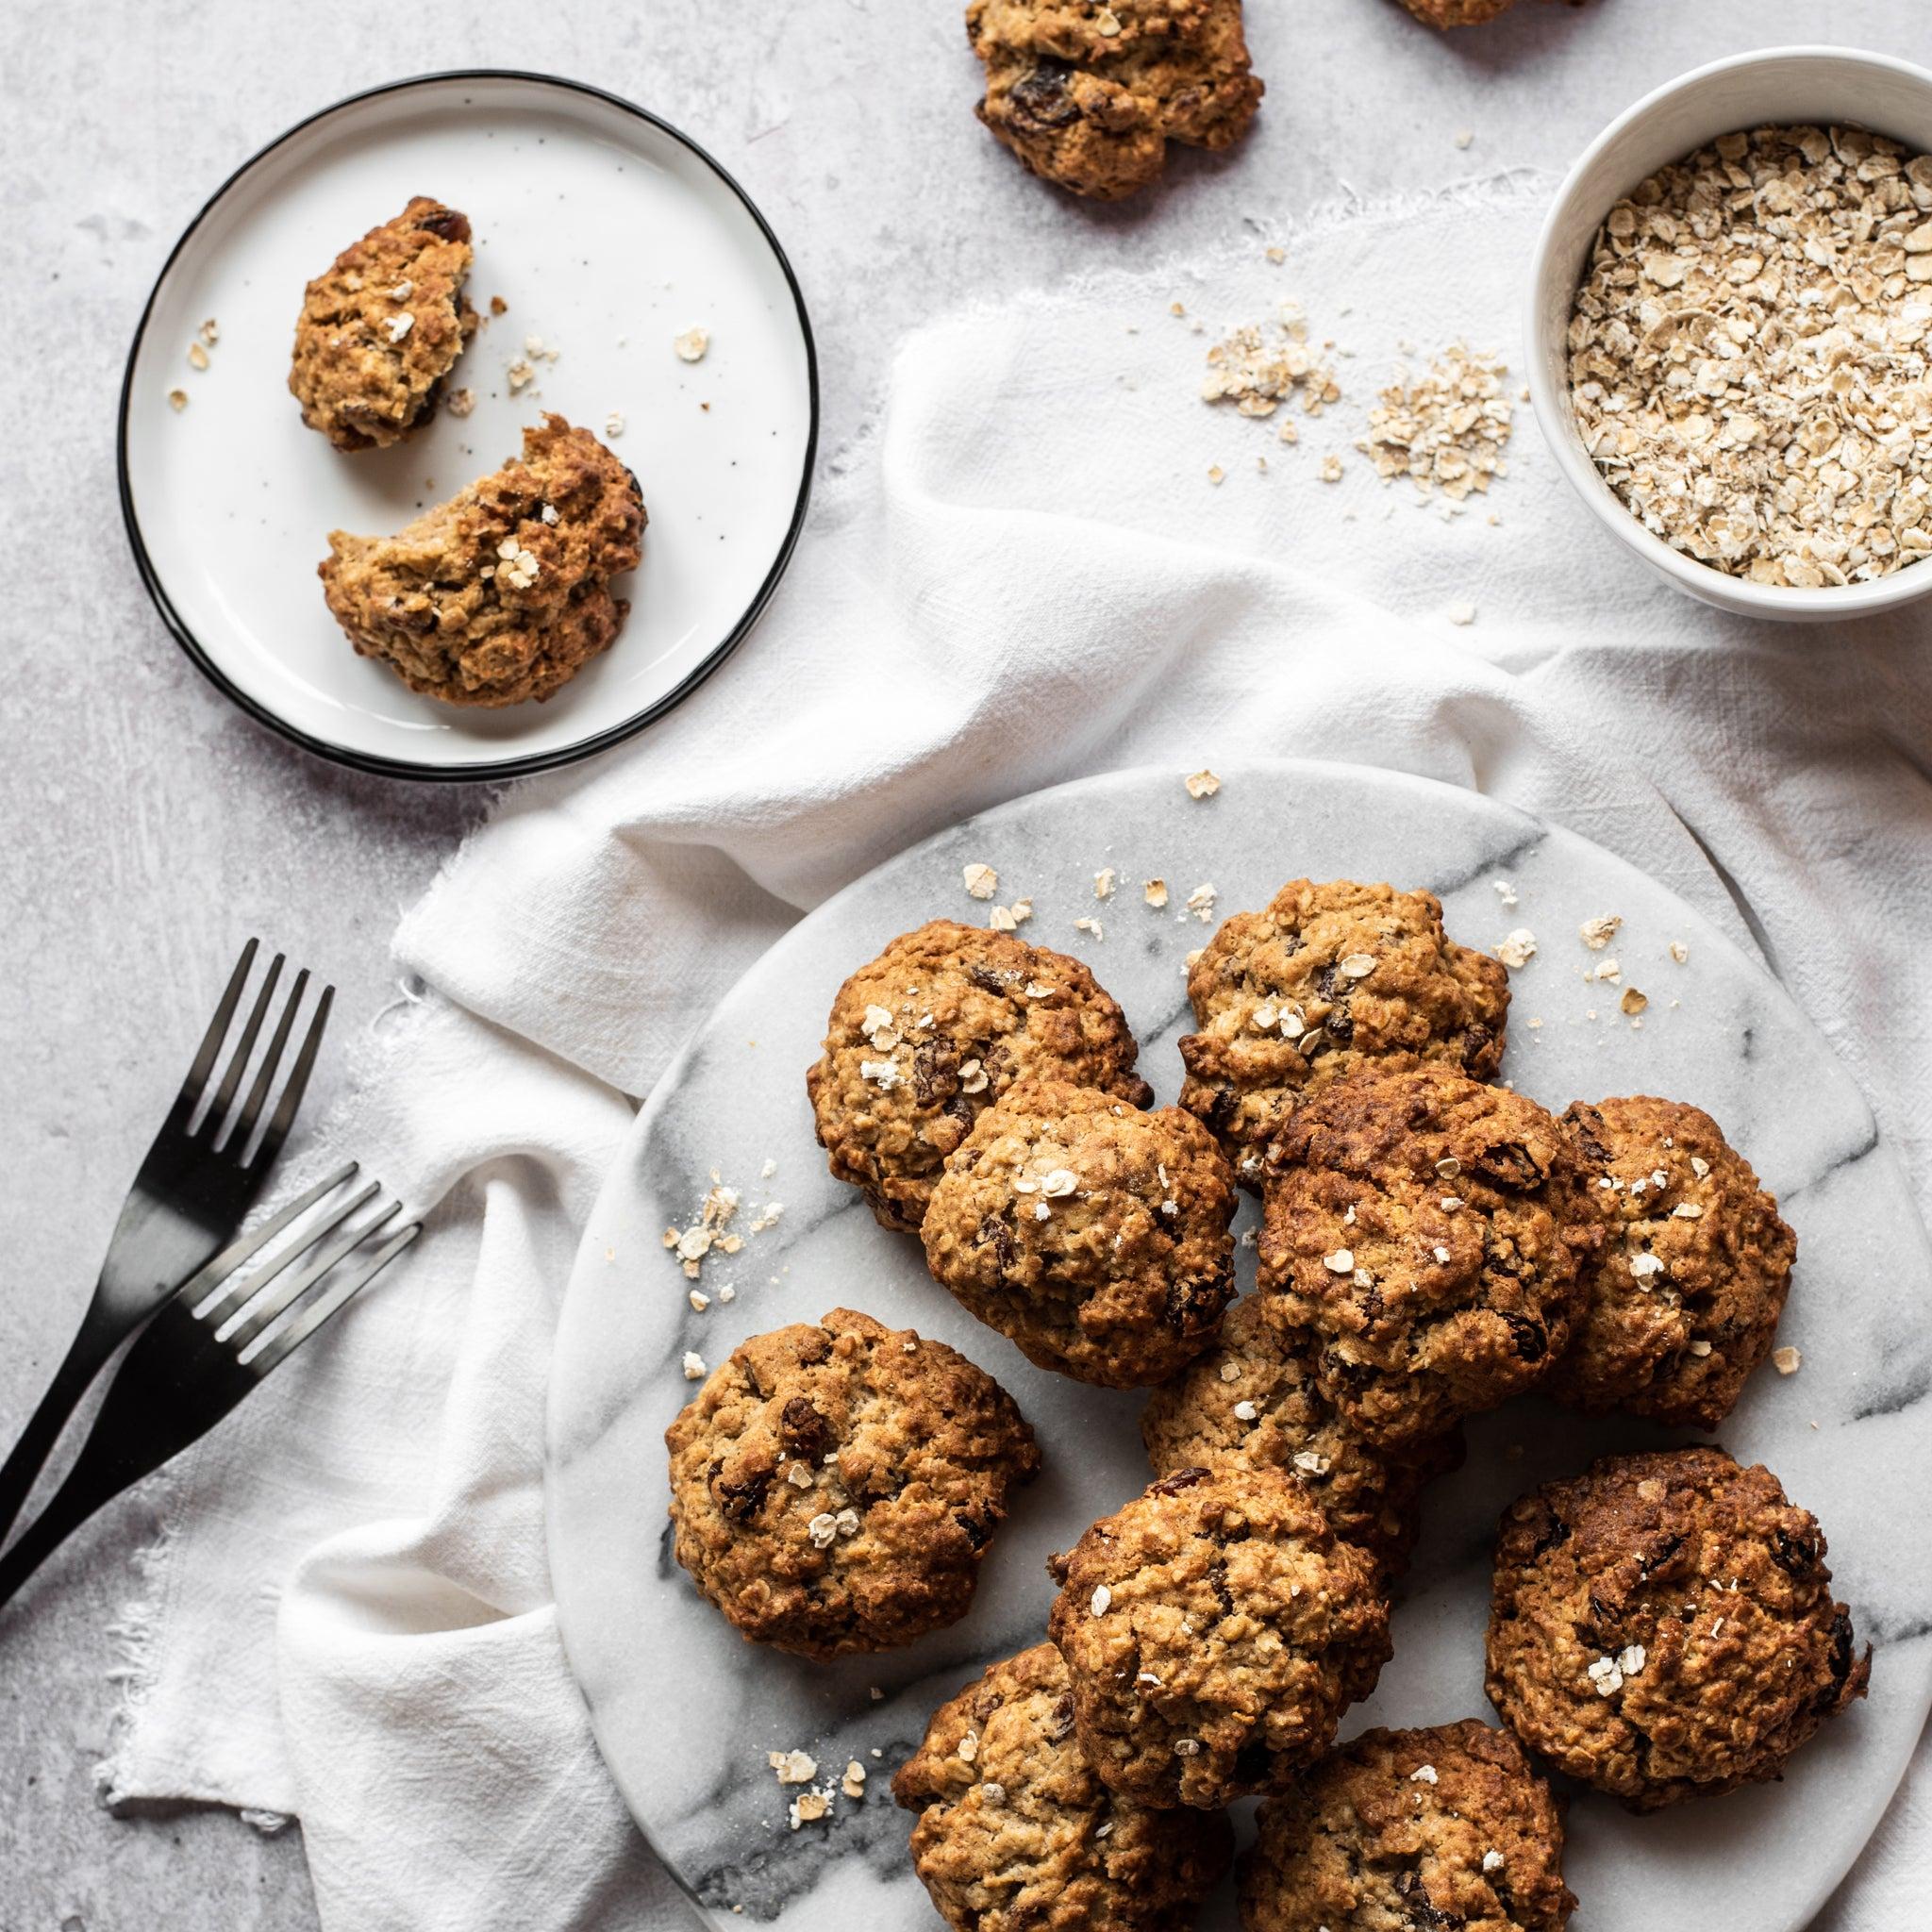 Oatmeal-Raisin-Cookies-SQUARE-2.jpg